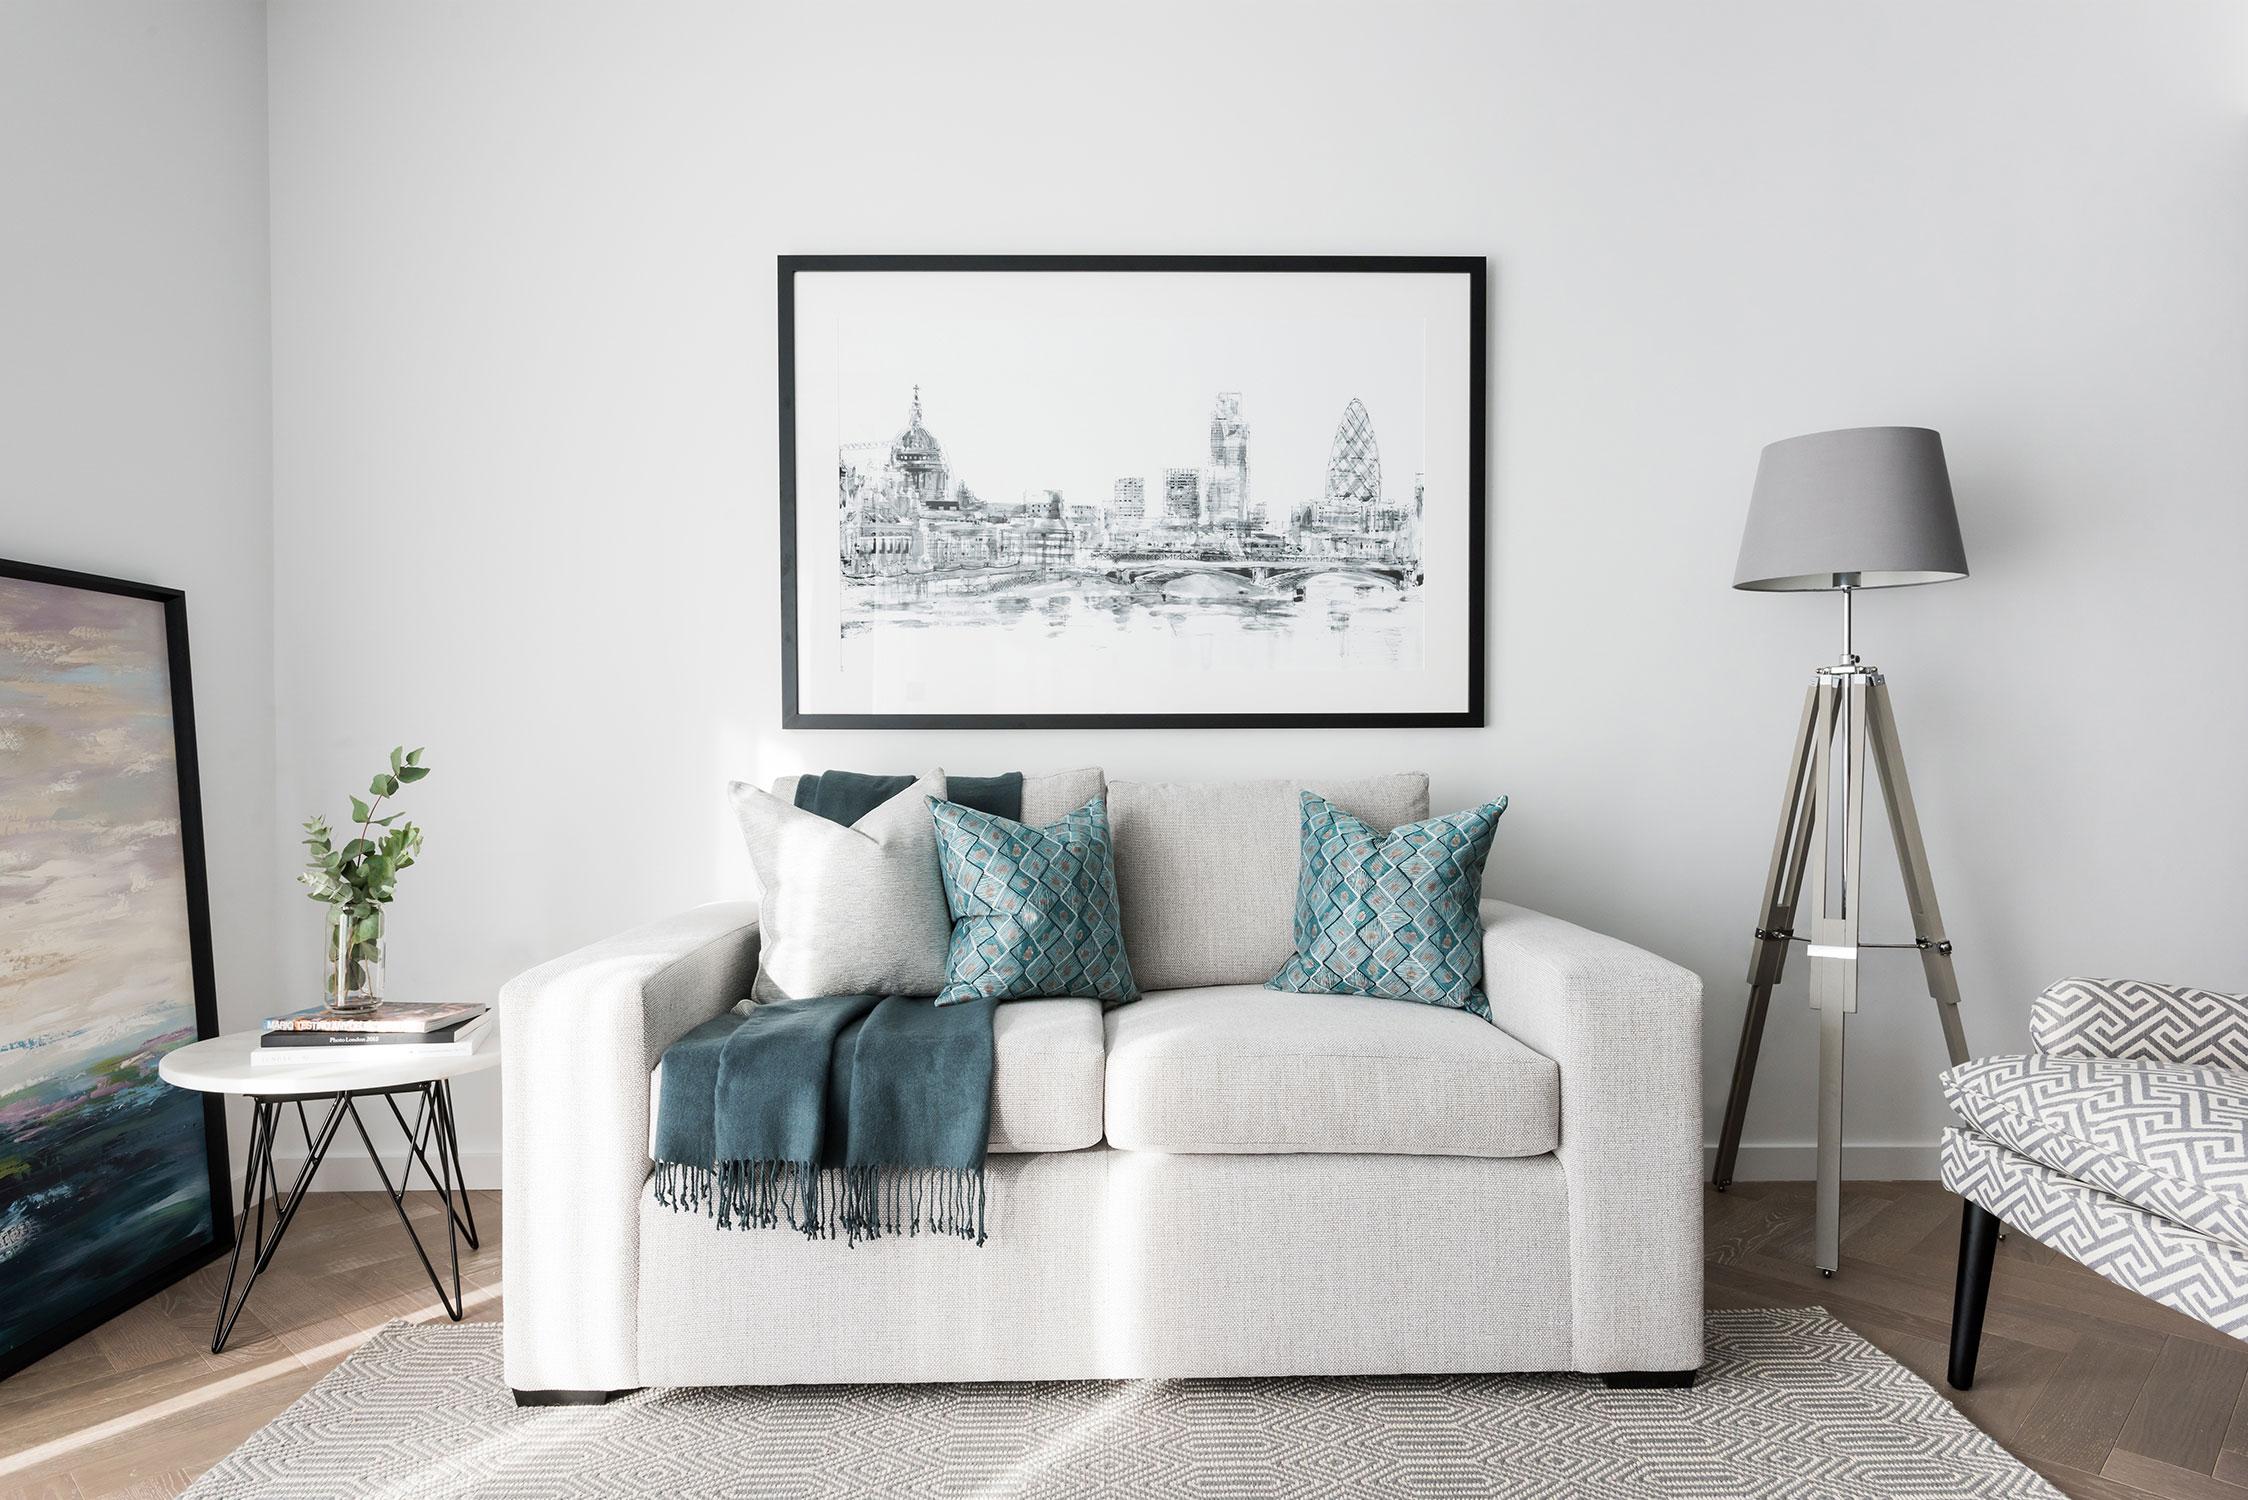 BoxNine7_Battersea_Power_Station_01_Living_Room_Entrance_Area_Sitting_Room.jpg